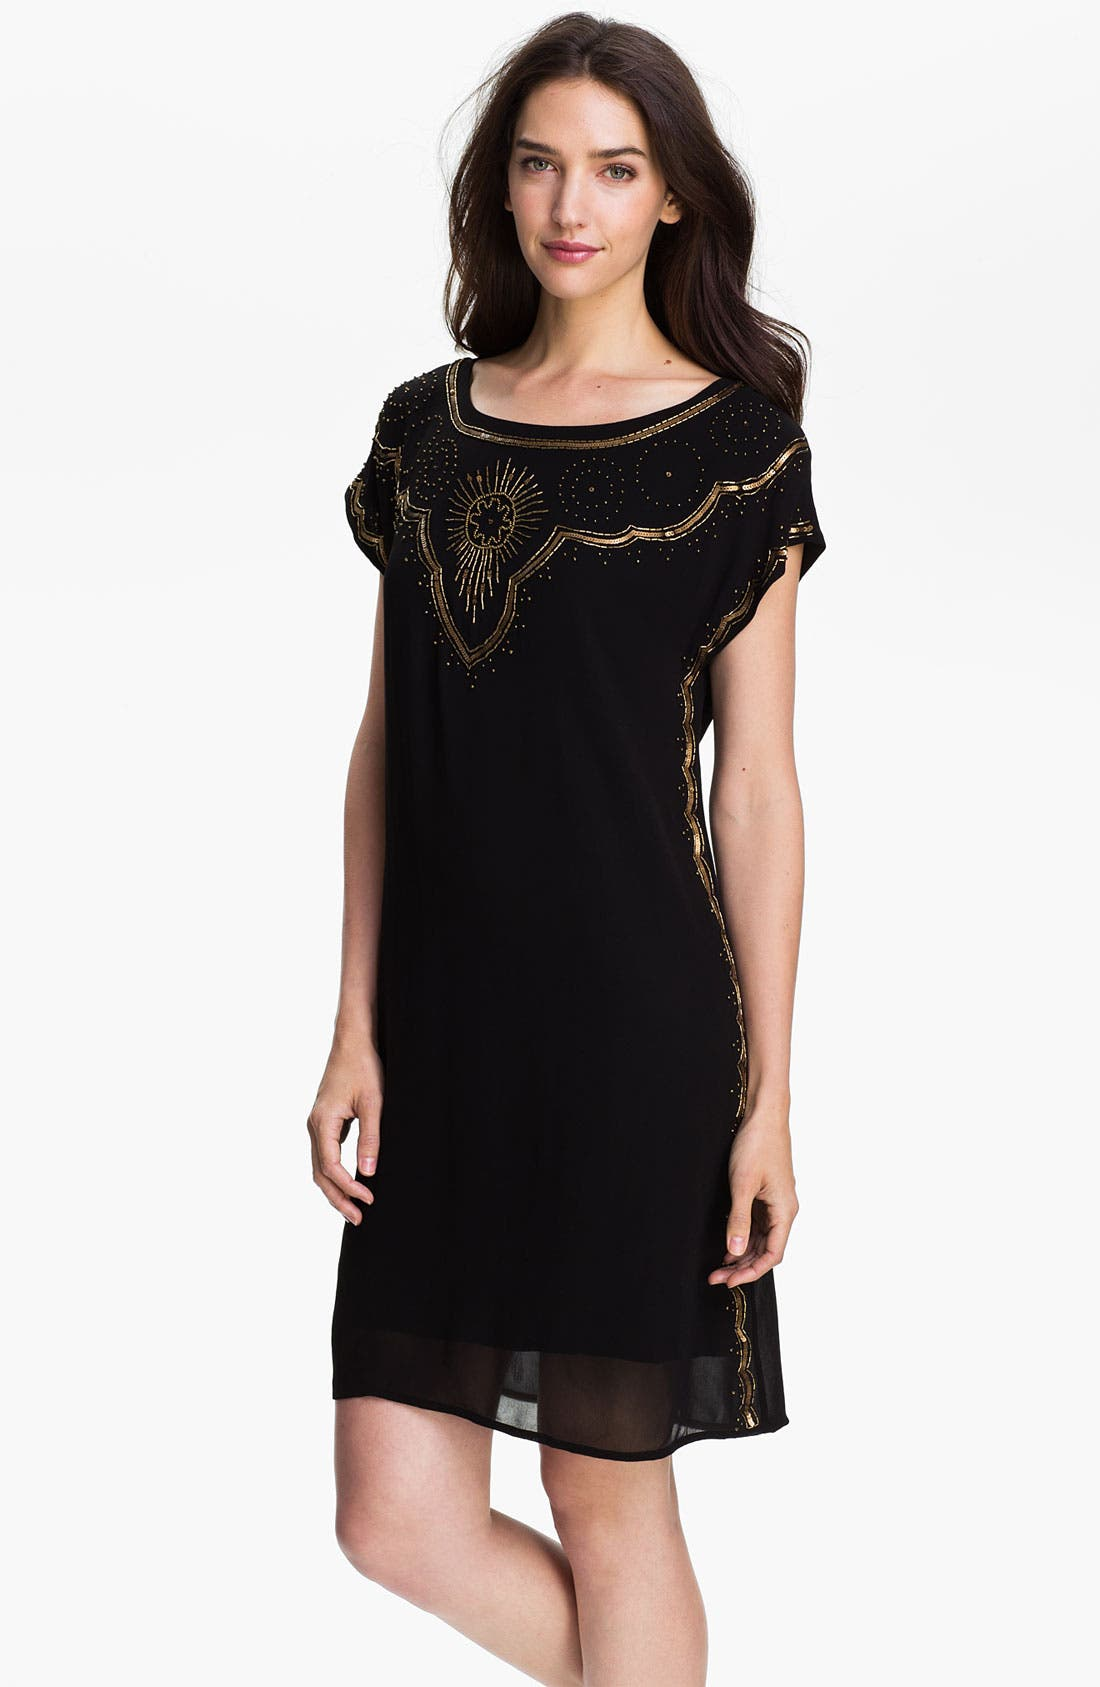 Alternate Image 1 Selected - Lucky Brand 'Good Fortune' Embellished Dress